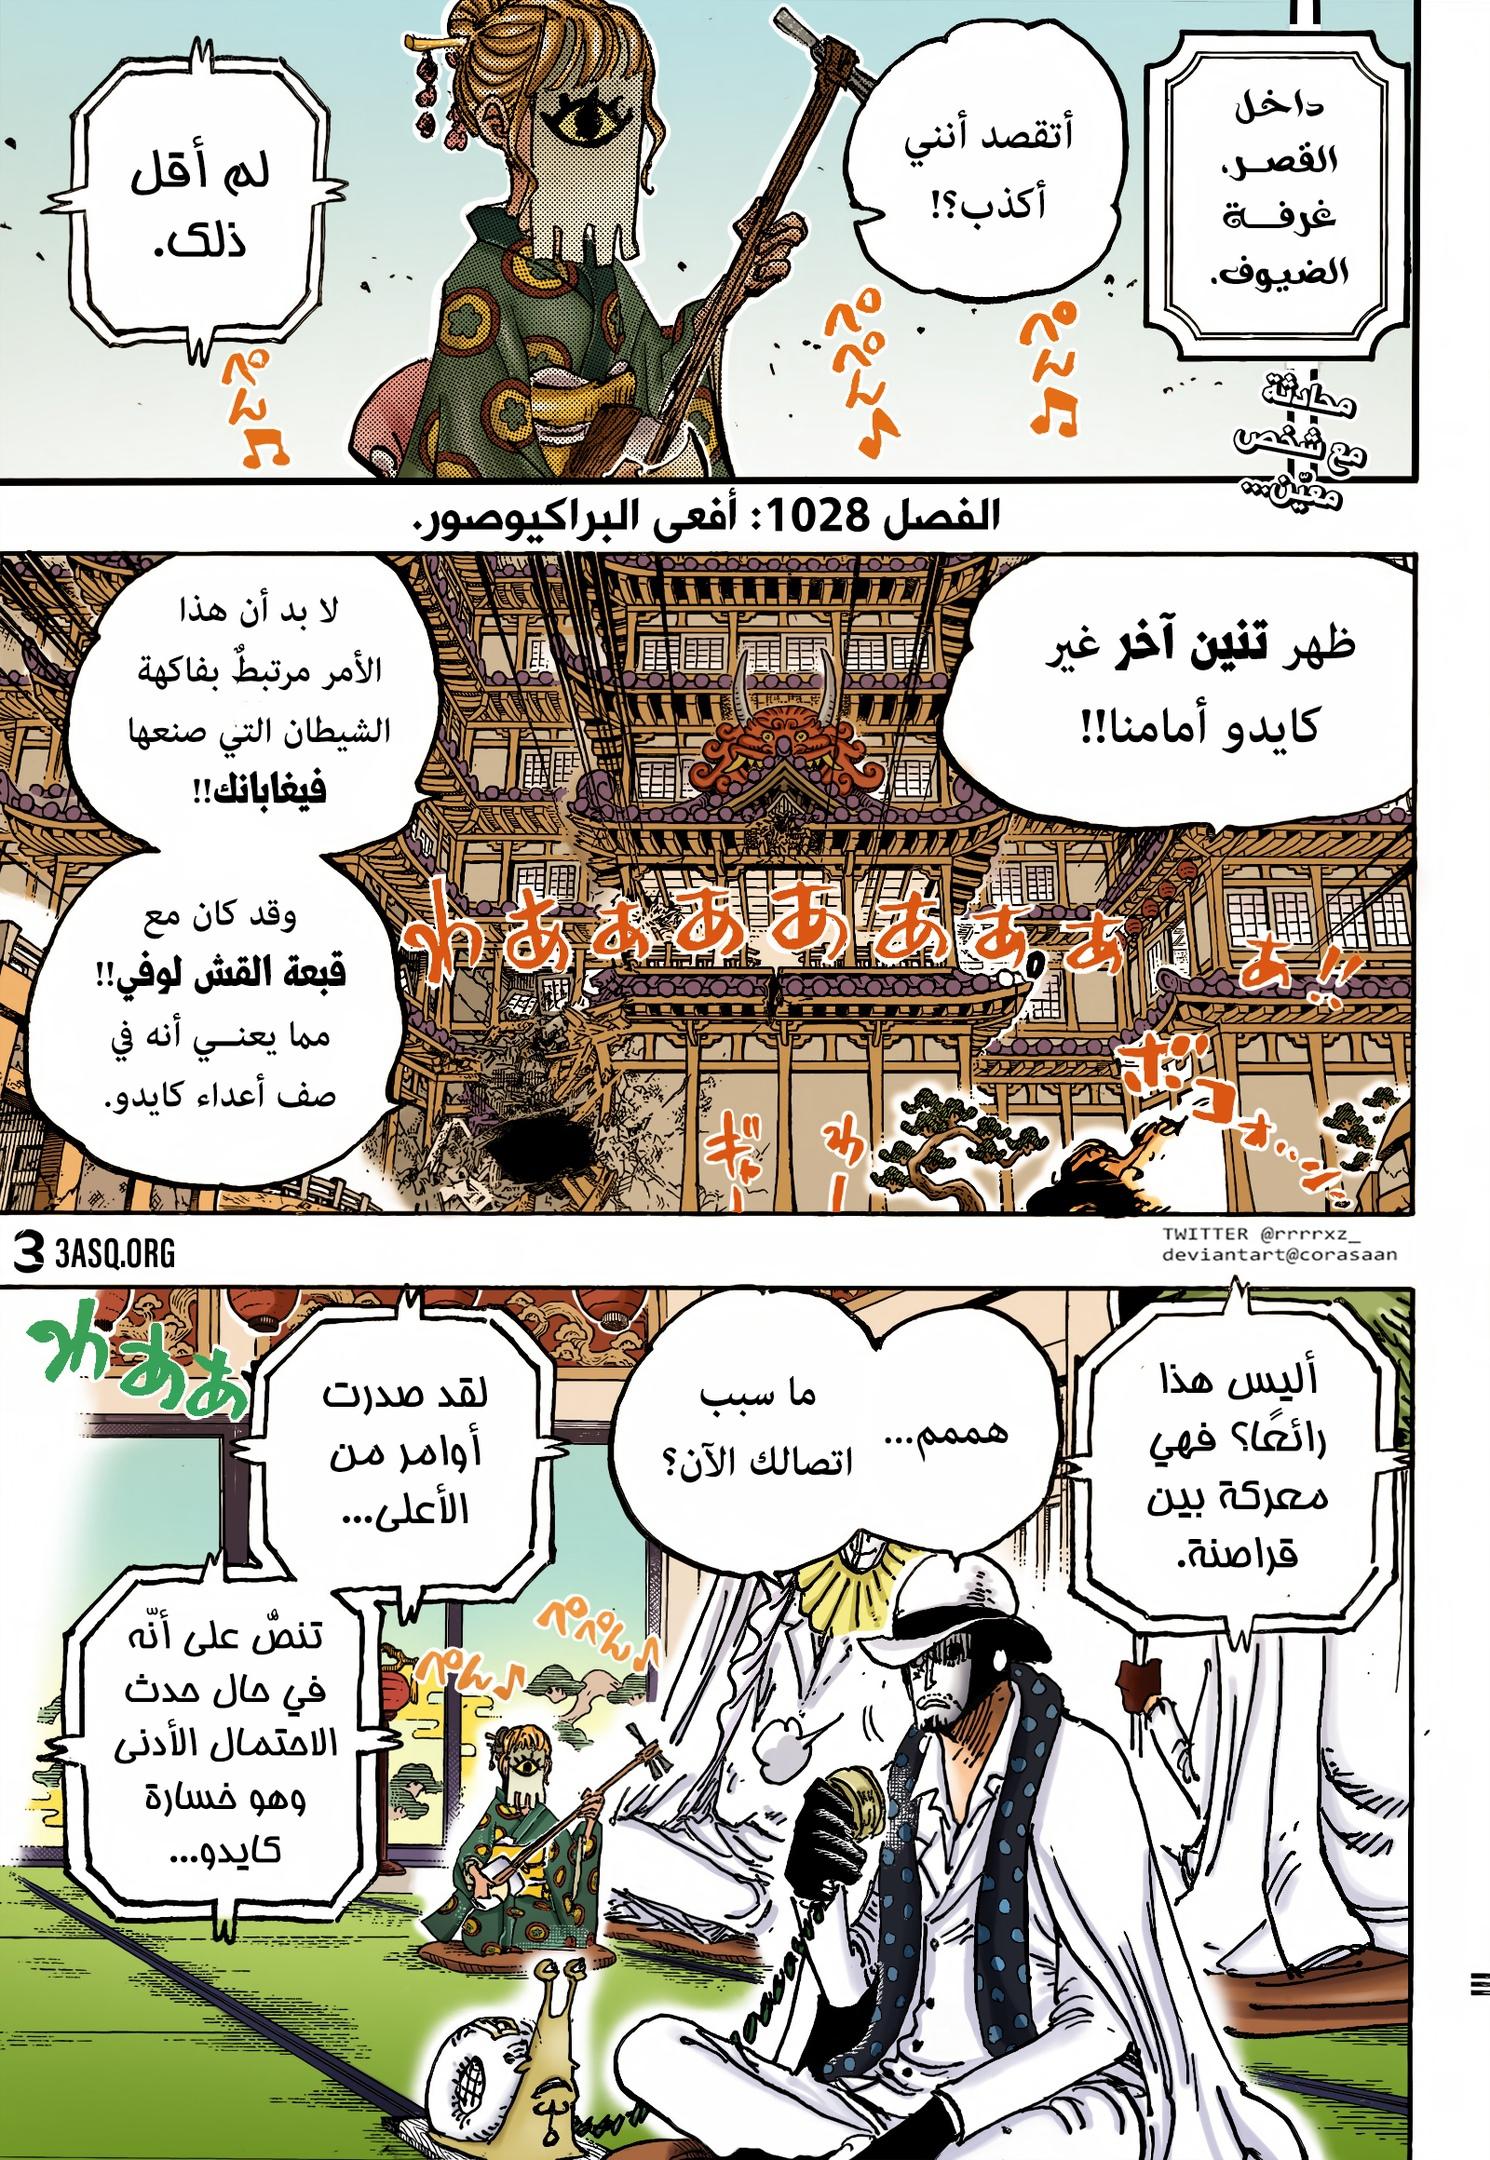 Arab One Piece 1028, image №22